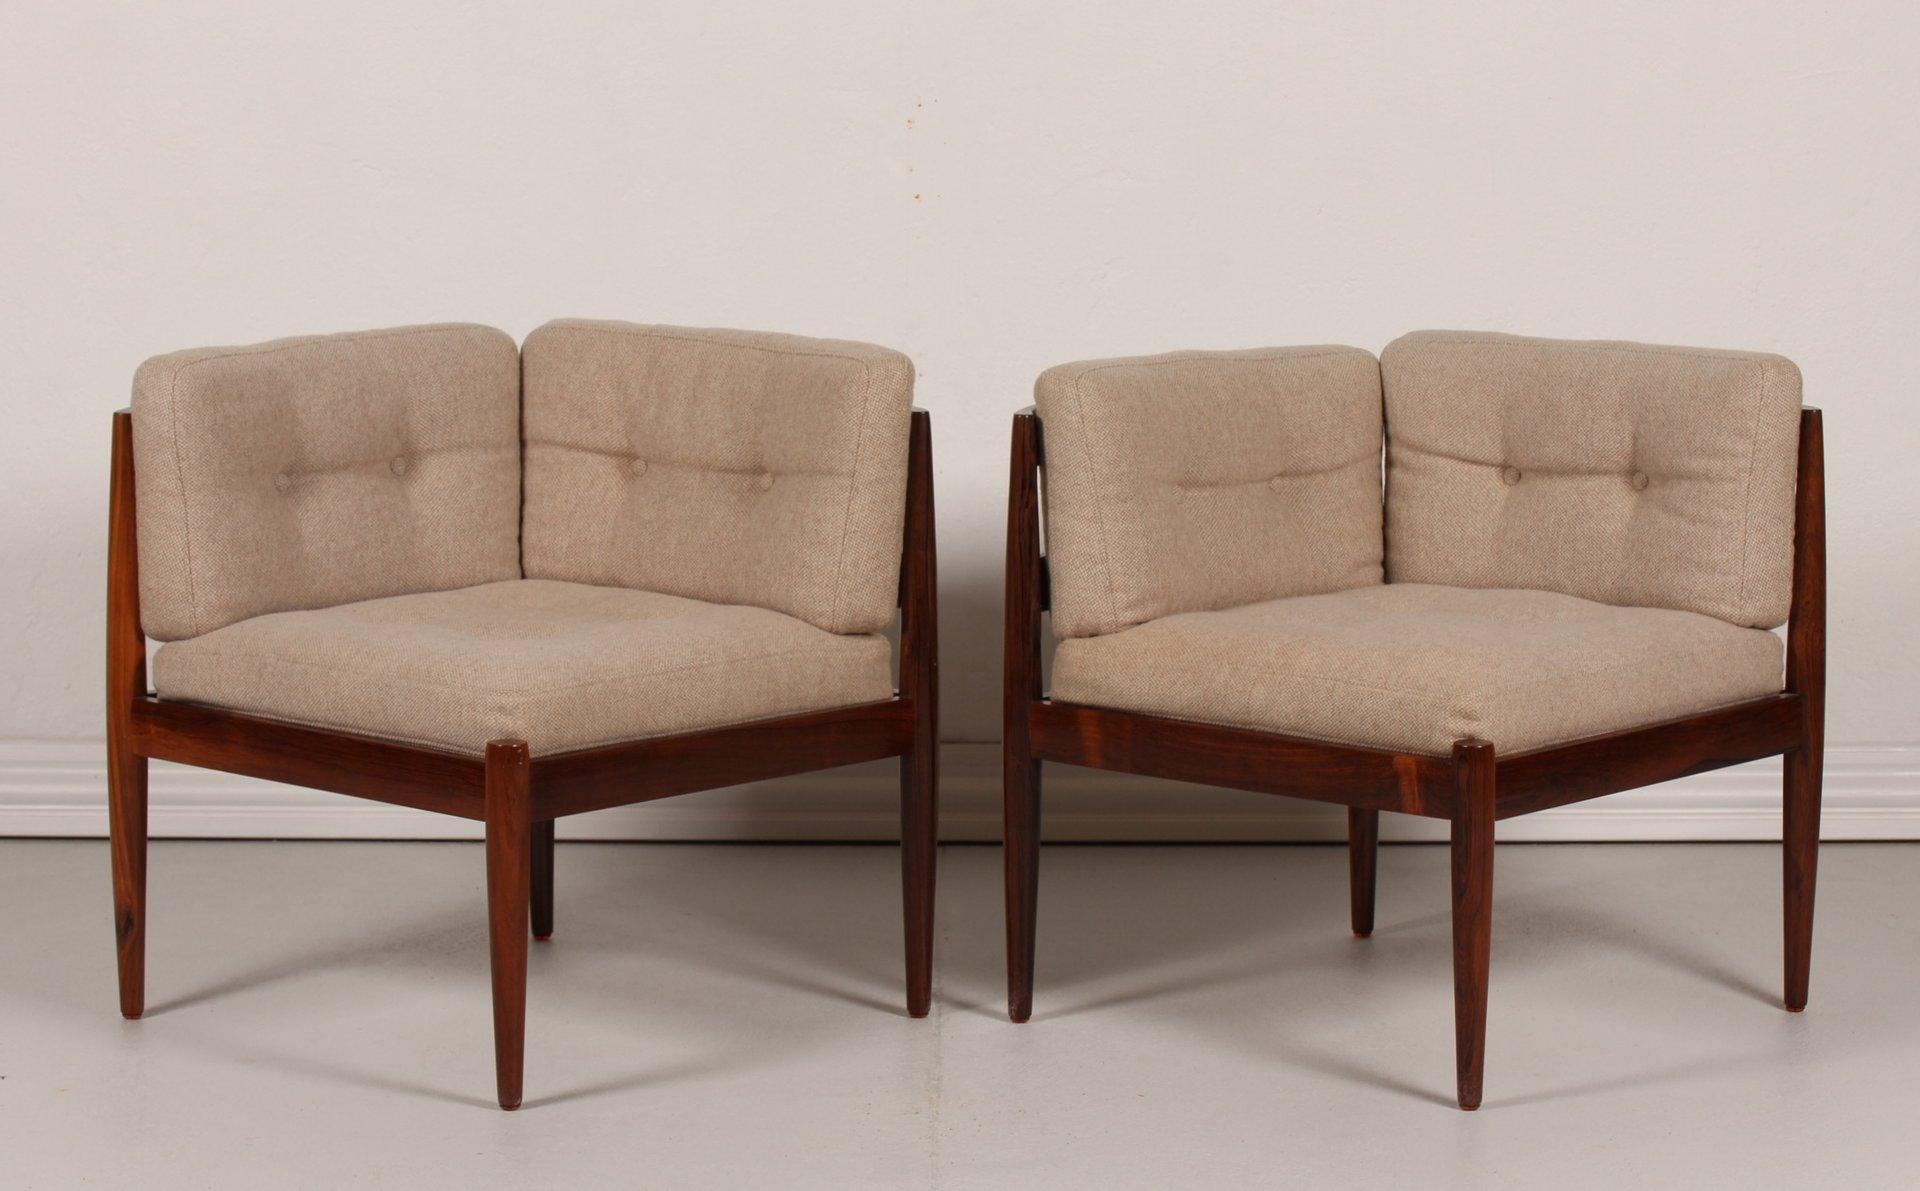 Modul Sofa modul line sofa in rosewood by kristiansen for magnus olesen